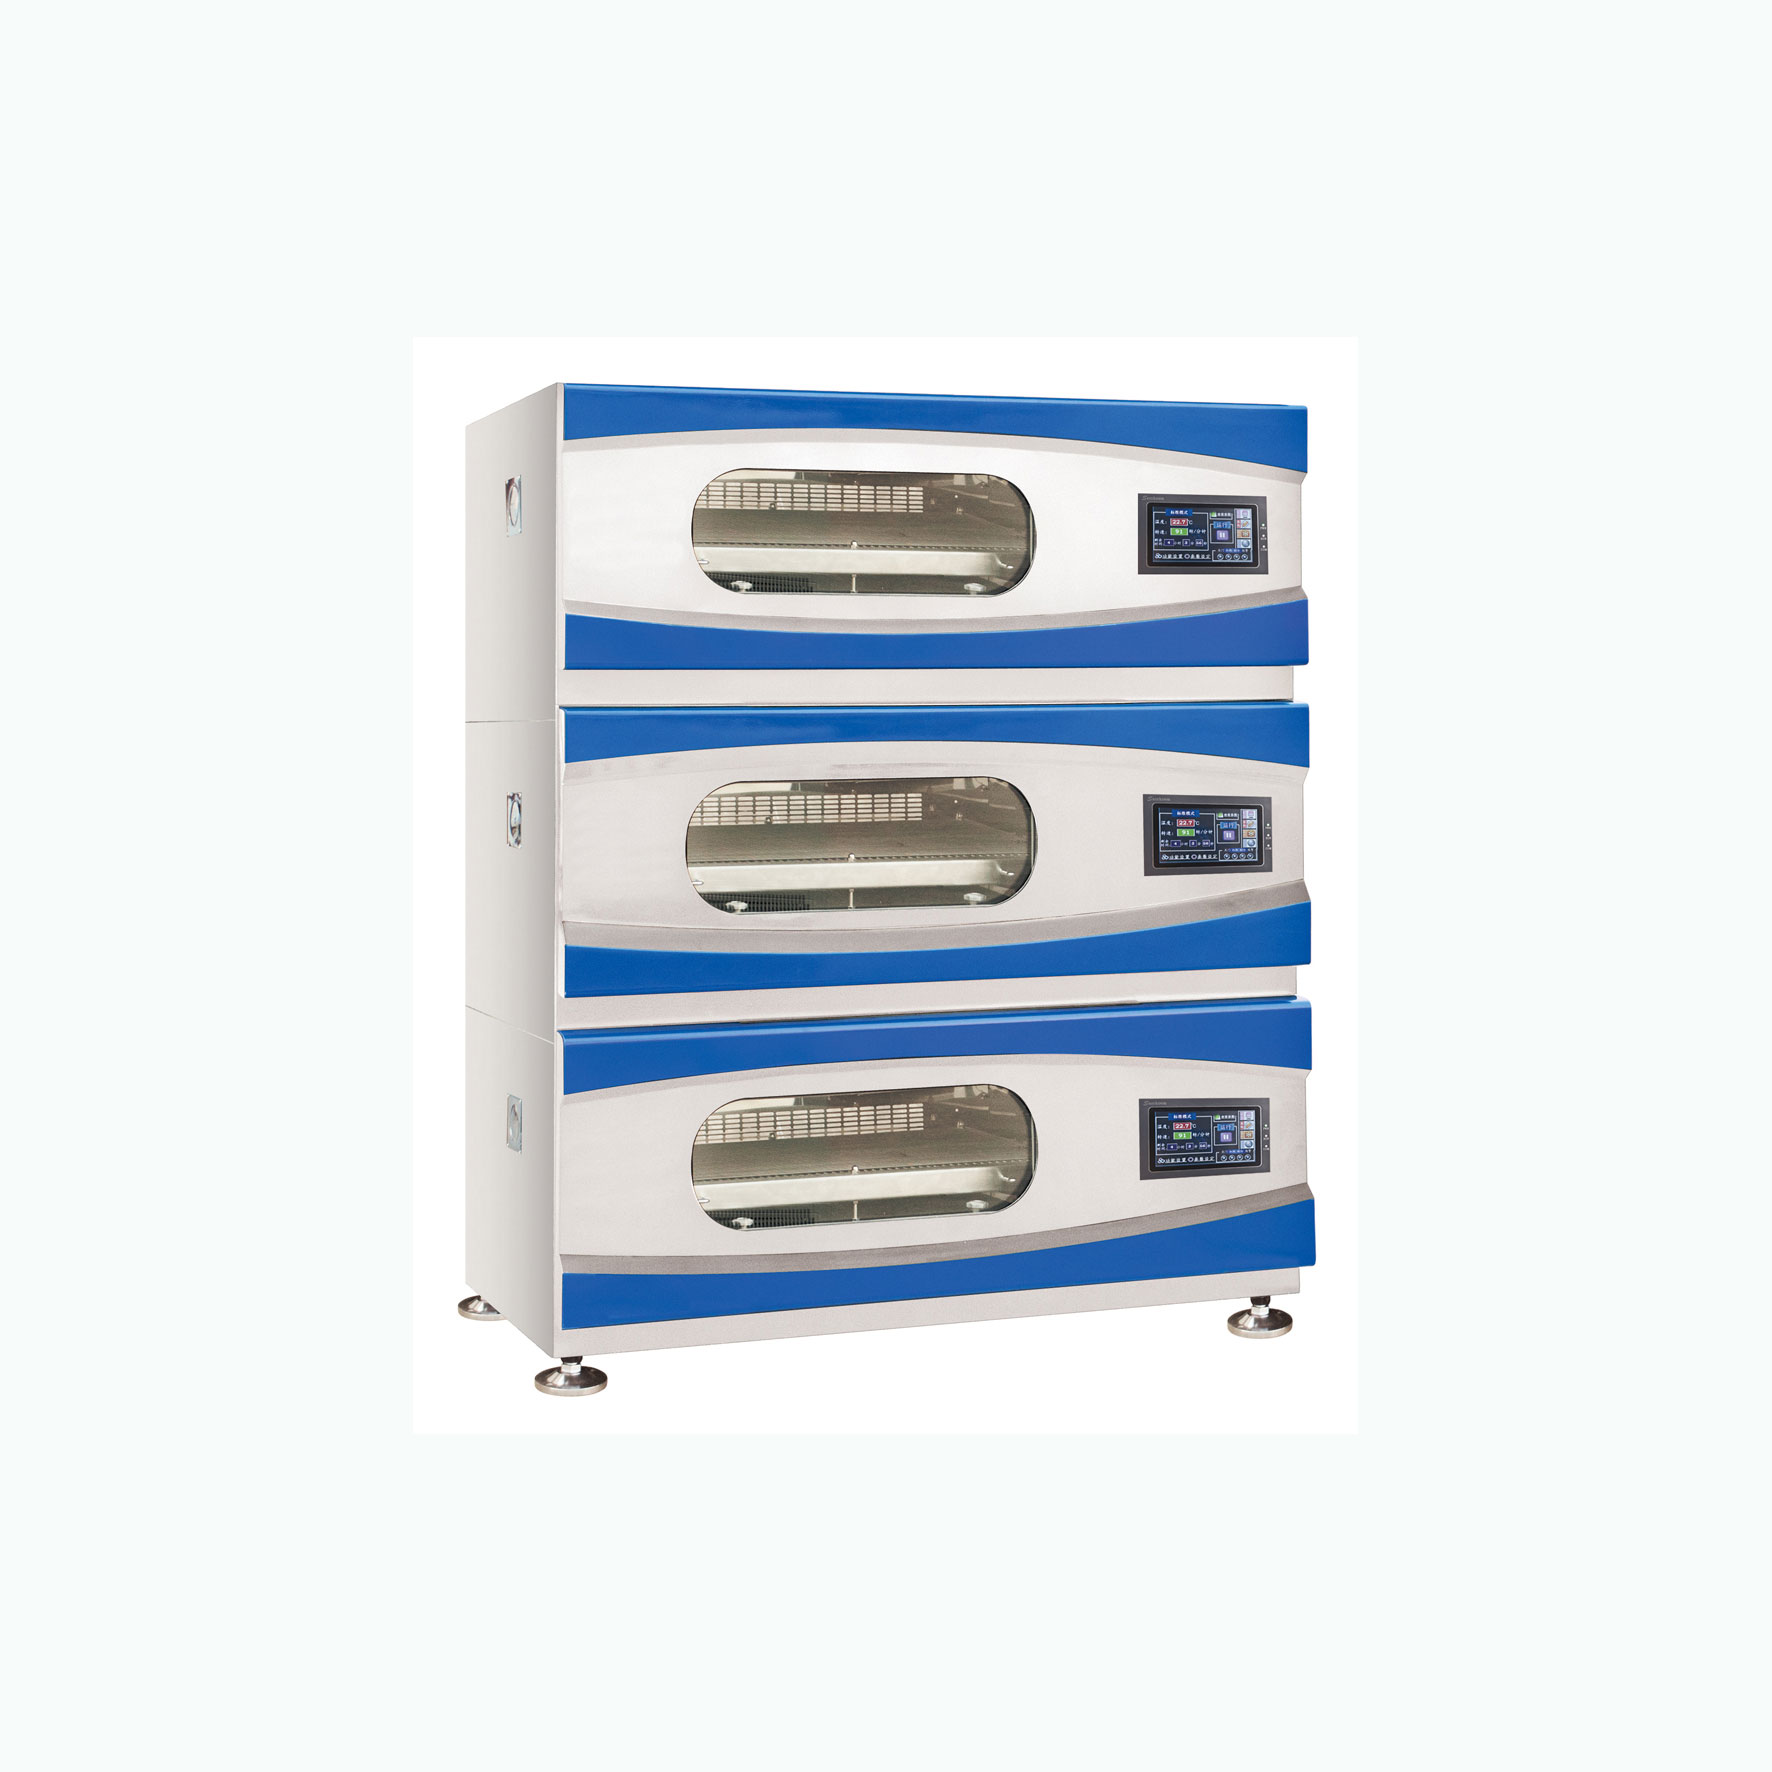 YJYC-110B触摸式彩屏叠加恒温培养振荡箱_上海跃进医疗器械有限公司